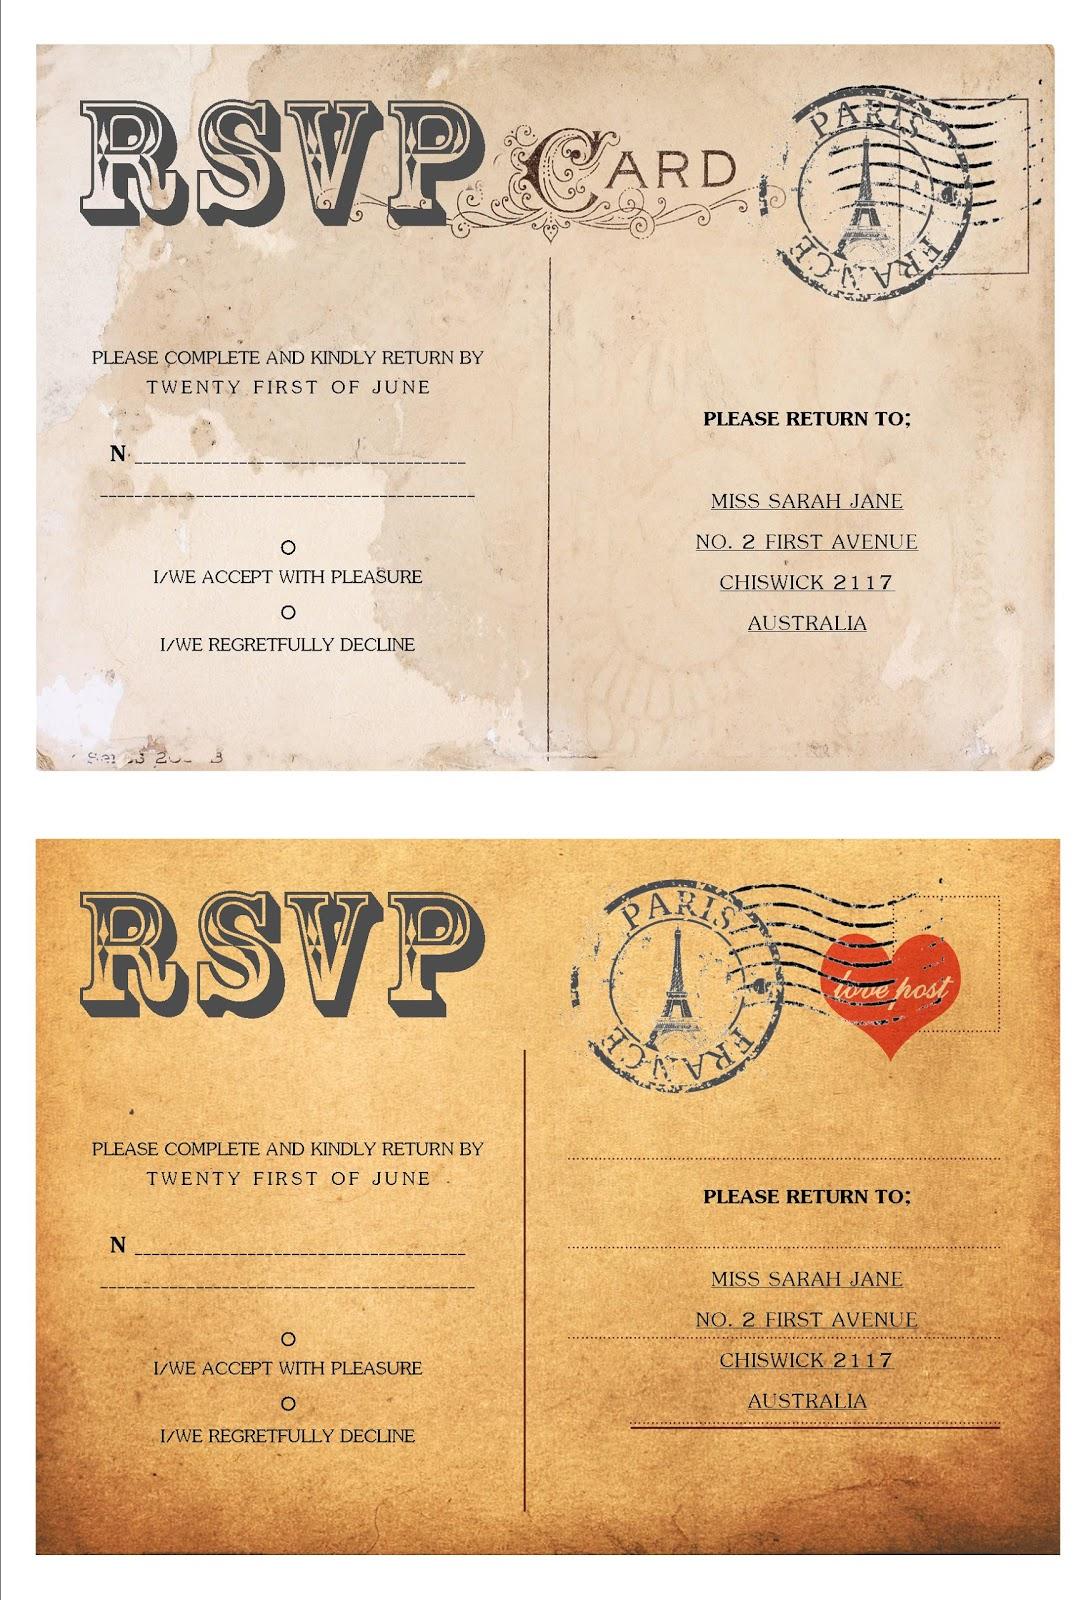 rsvp cards for weddings templates - effortless weddings stationery april 2011